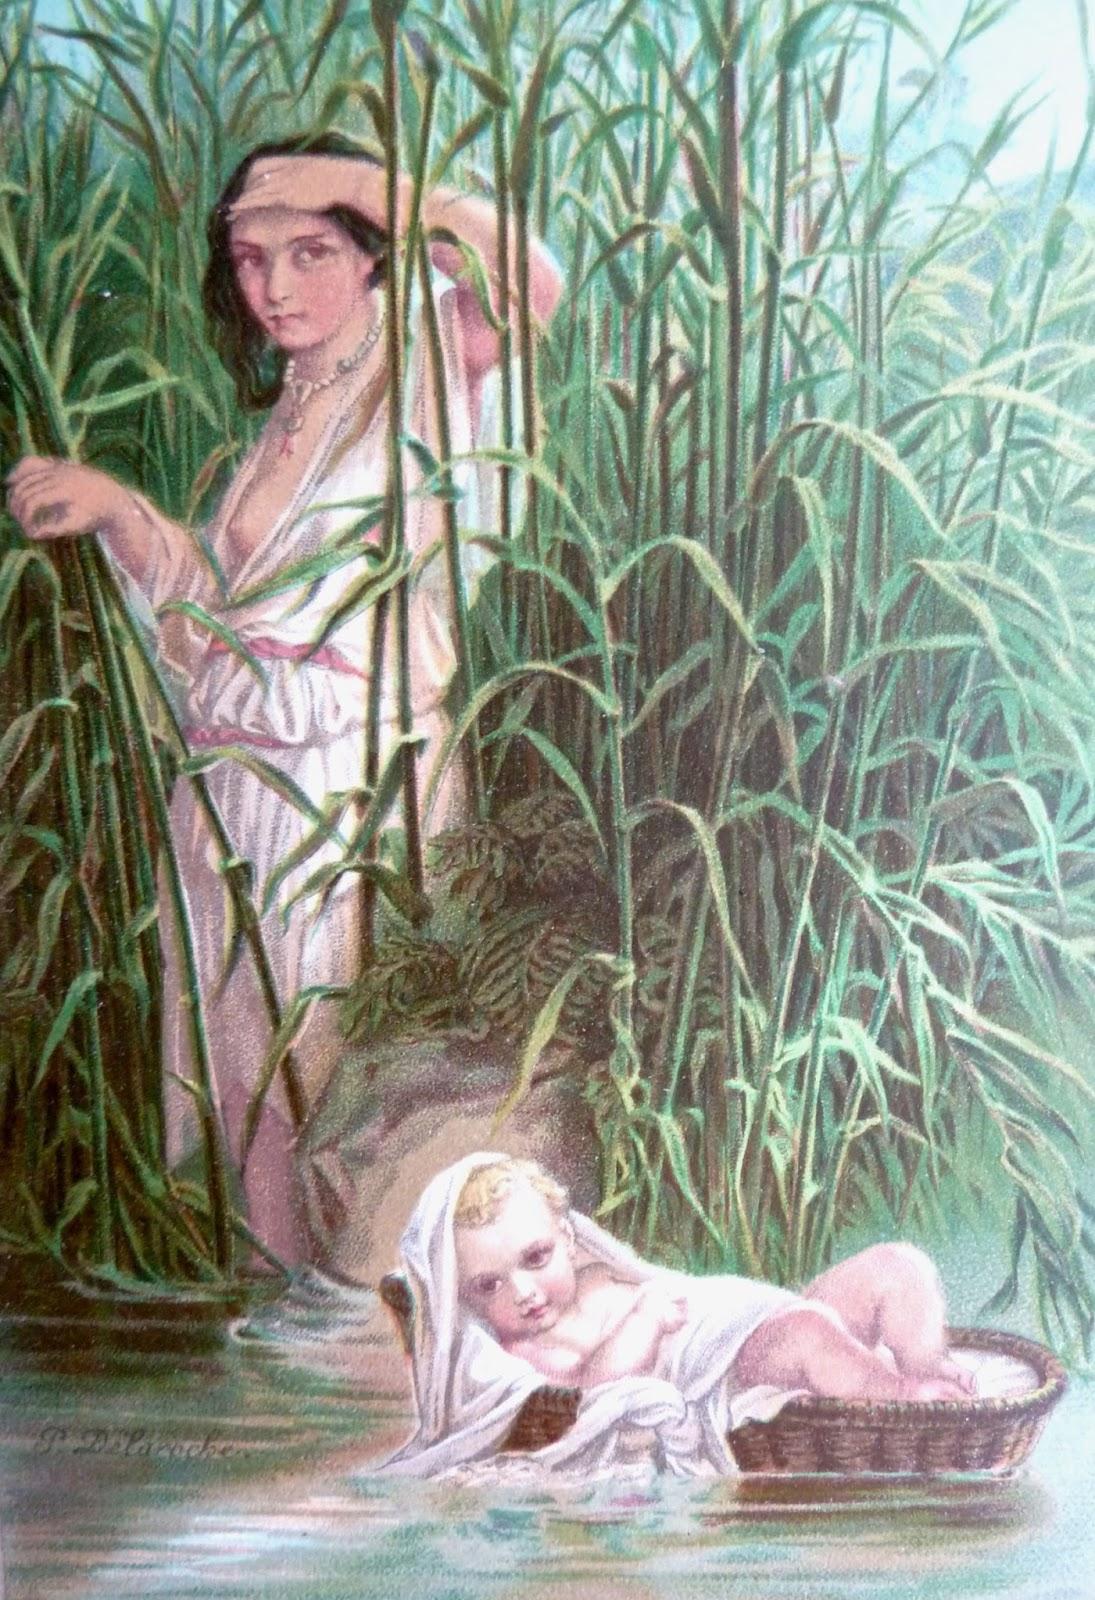 Miriam the prophetess, Aaron's sister (Exodus 15:20)